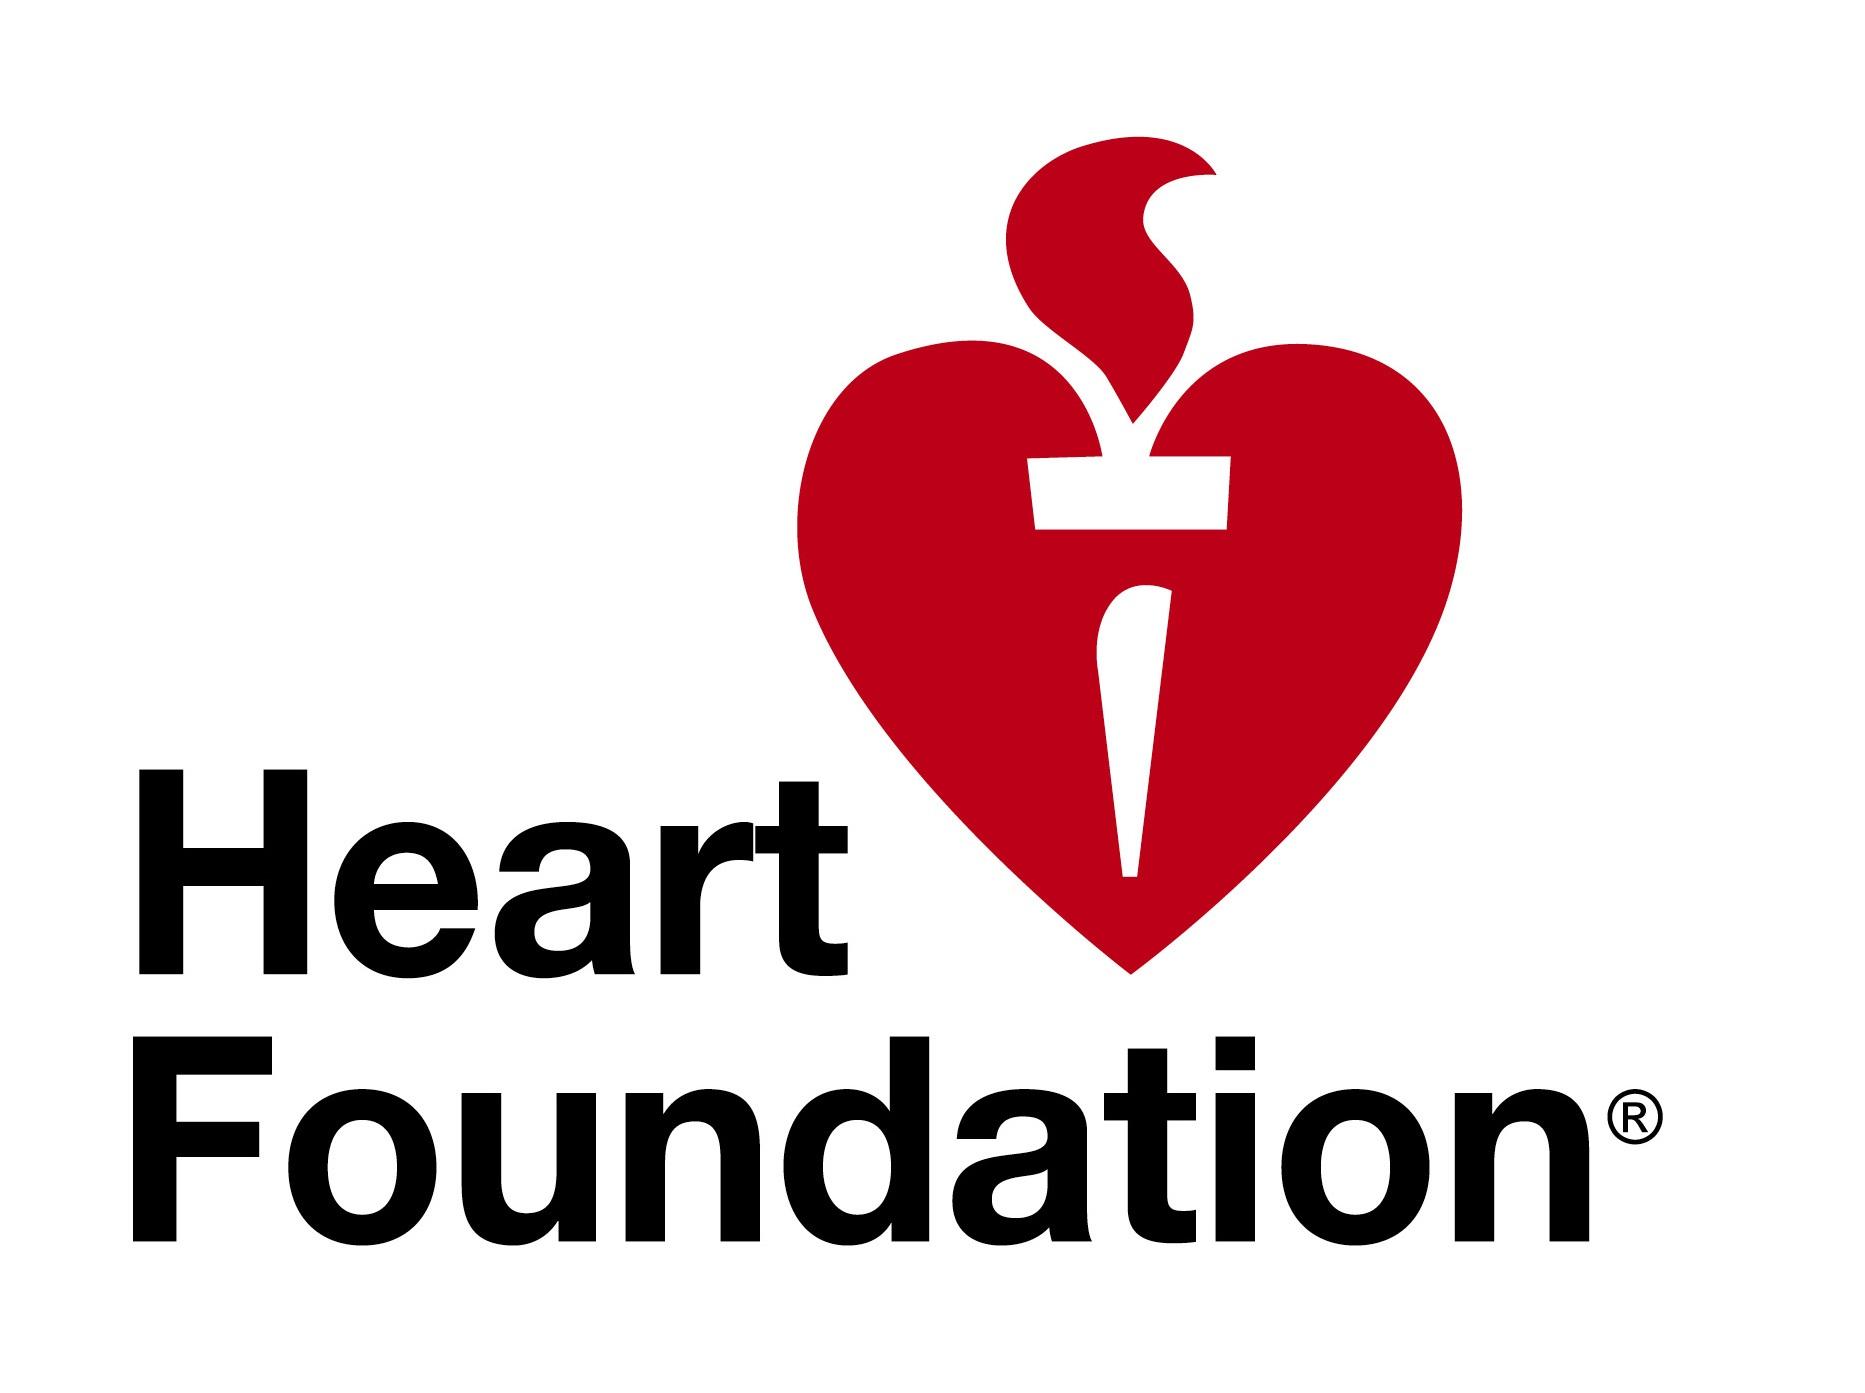 National Heart Foundation logo